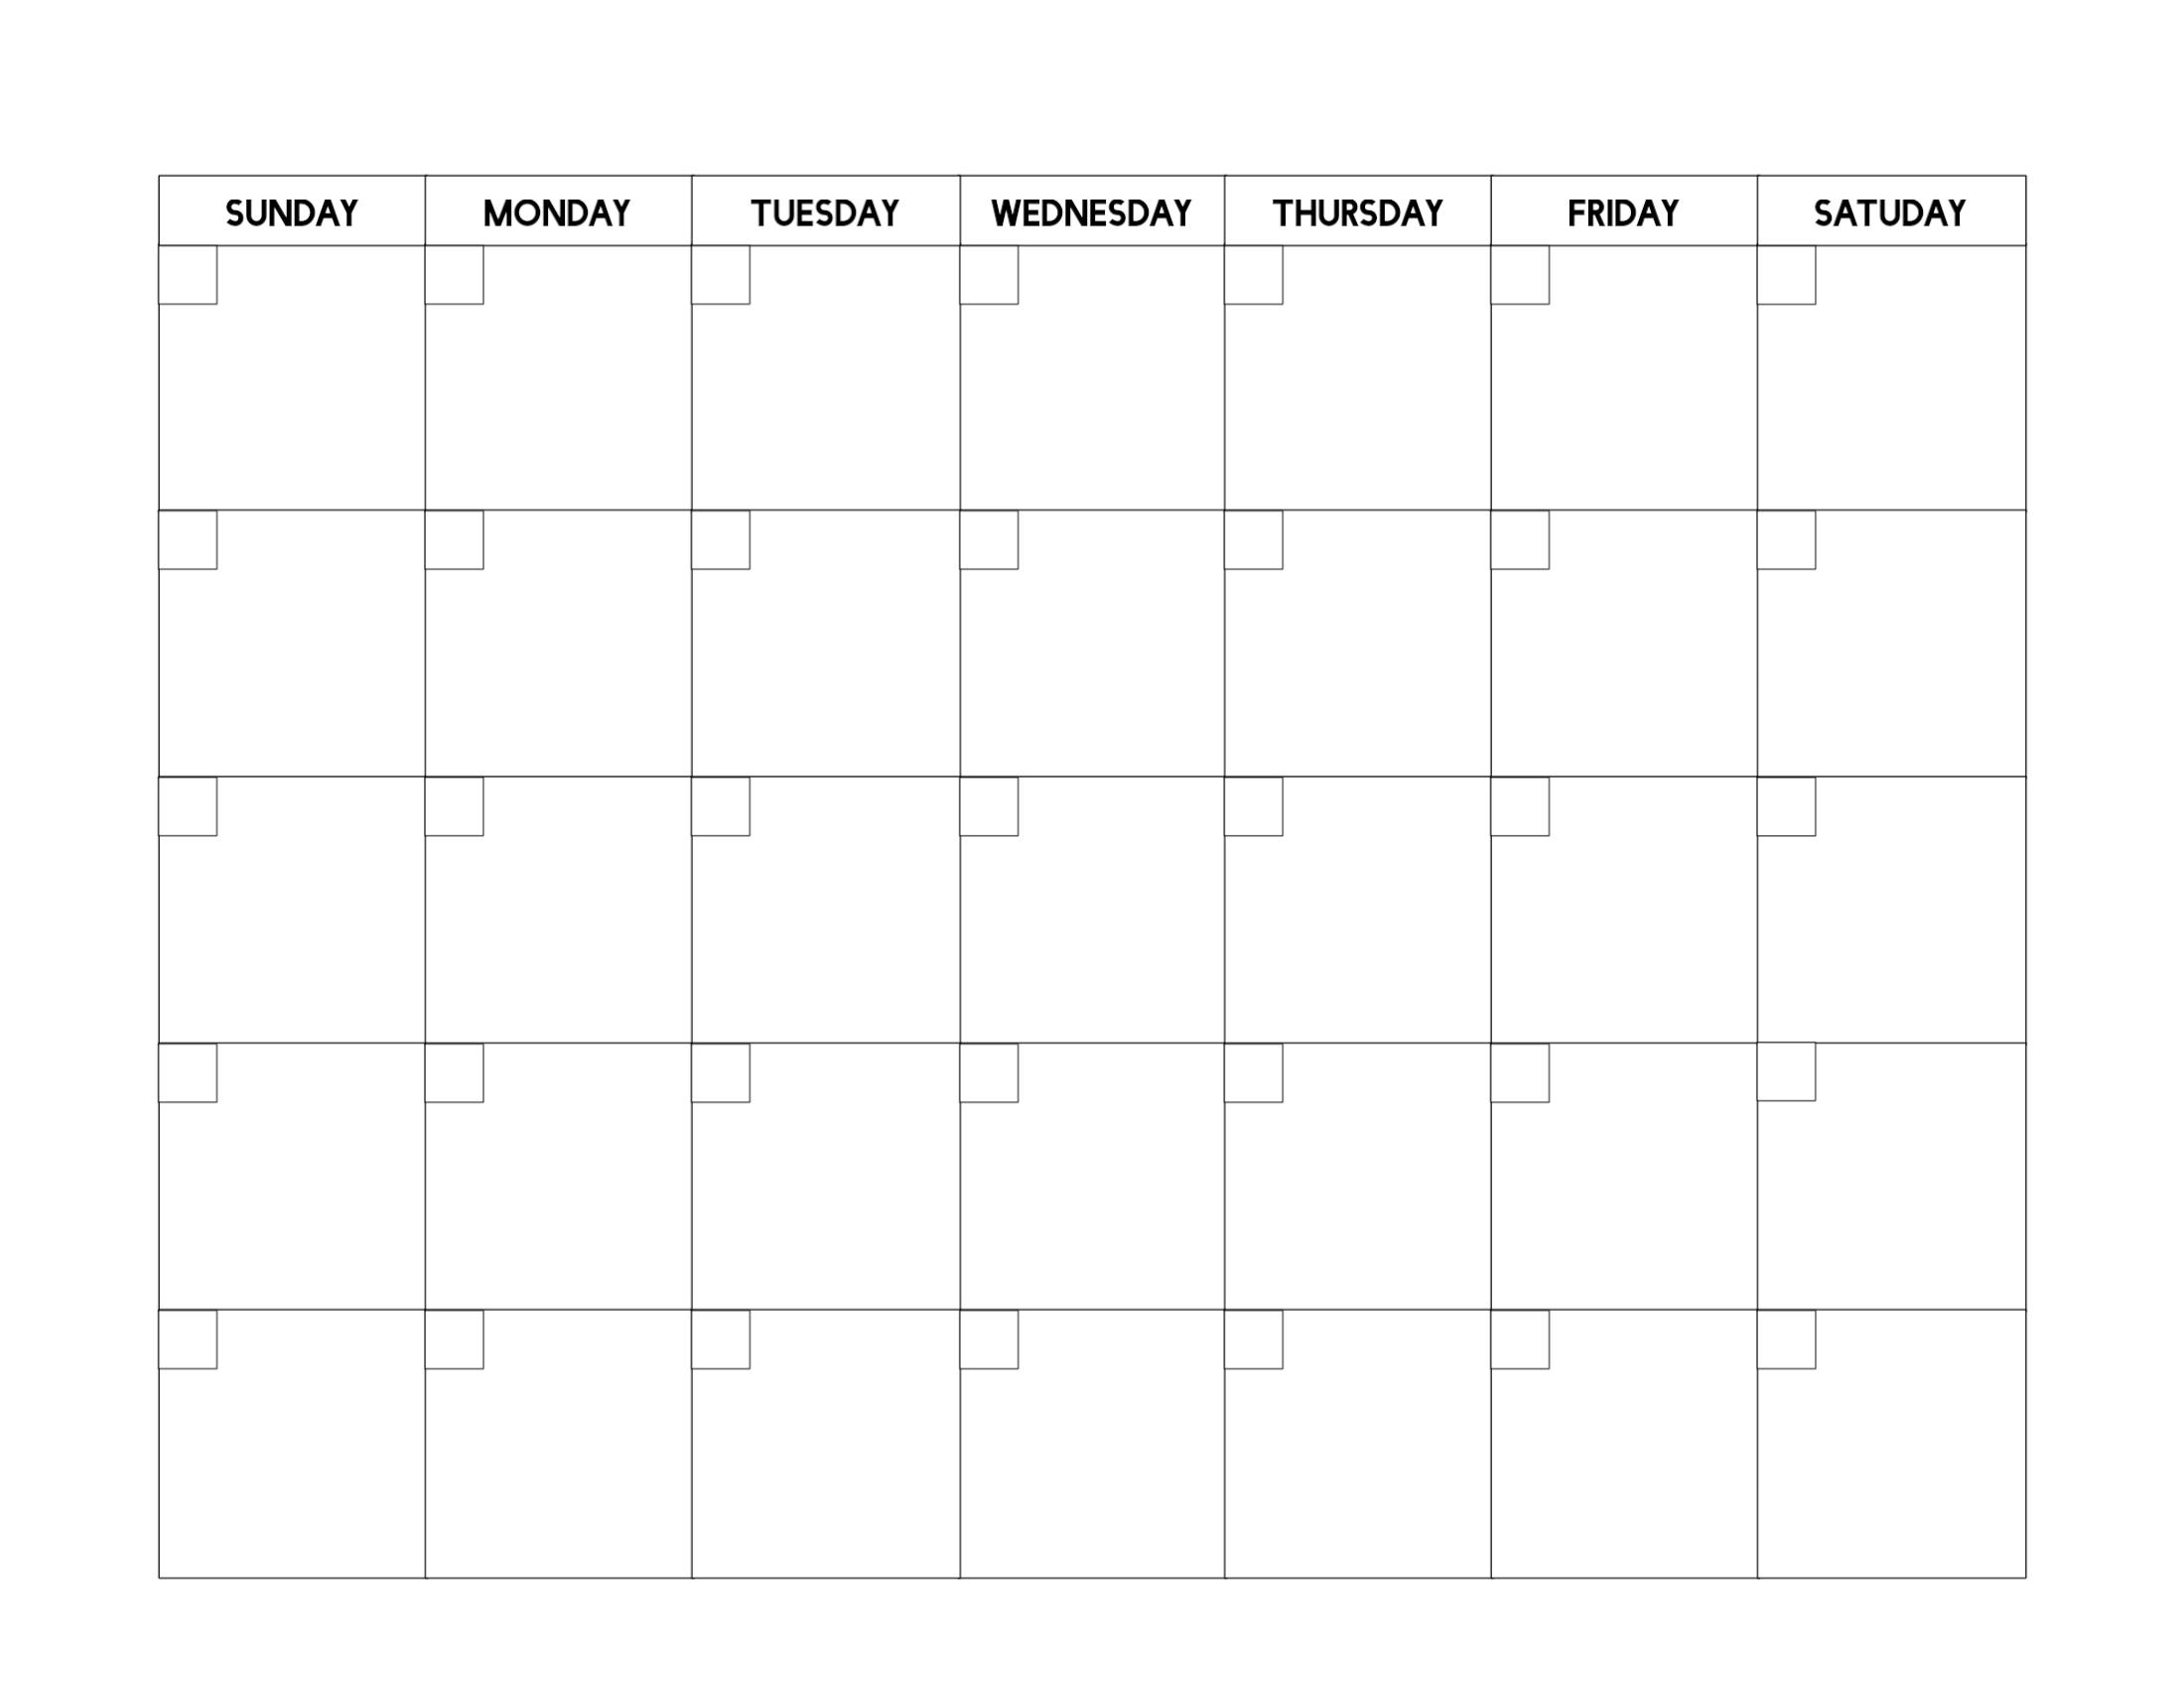 Free Printable Blank Calendar Template  Paper Trail Design intended for Blank 5 Day Calendar